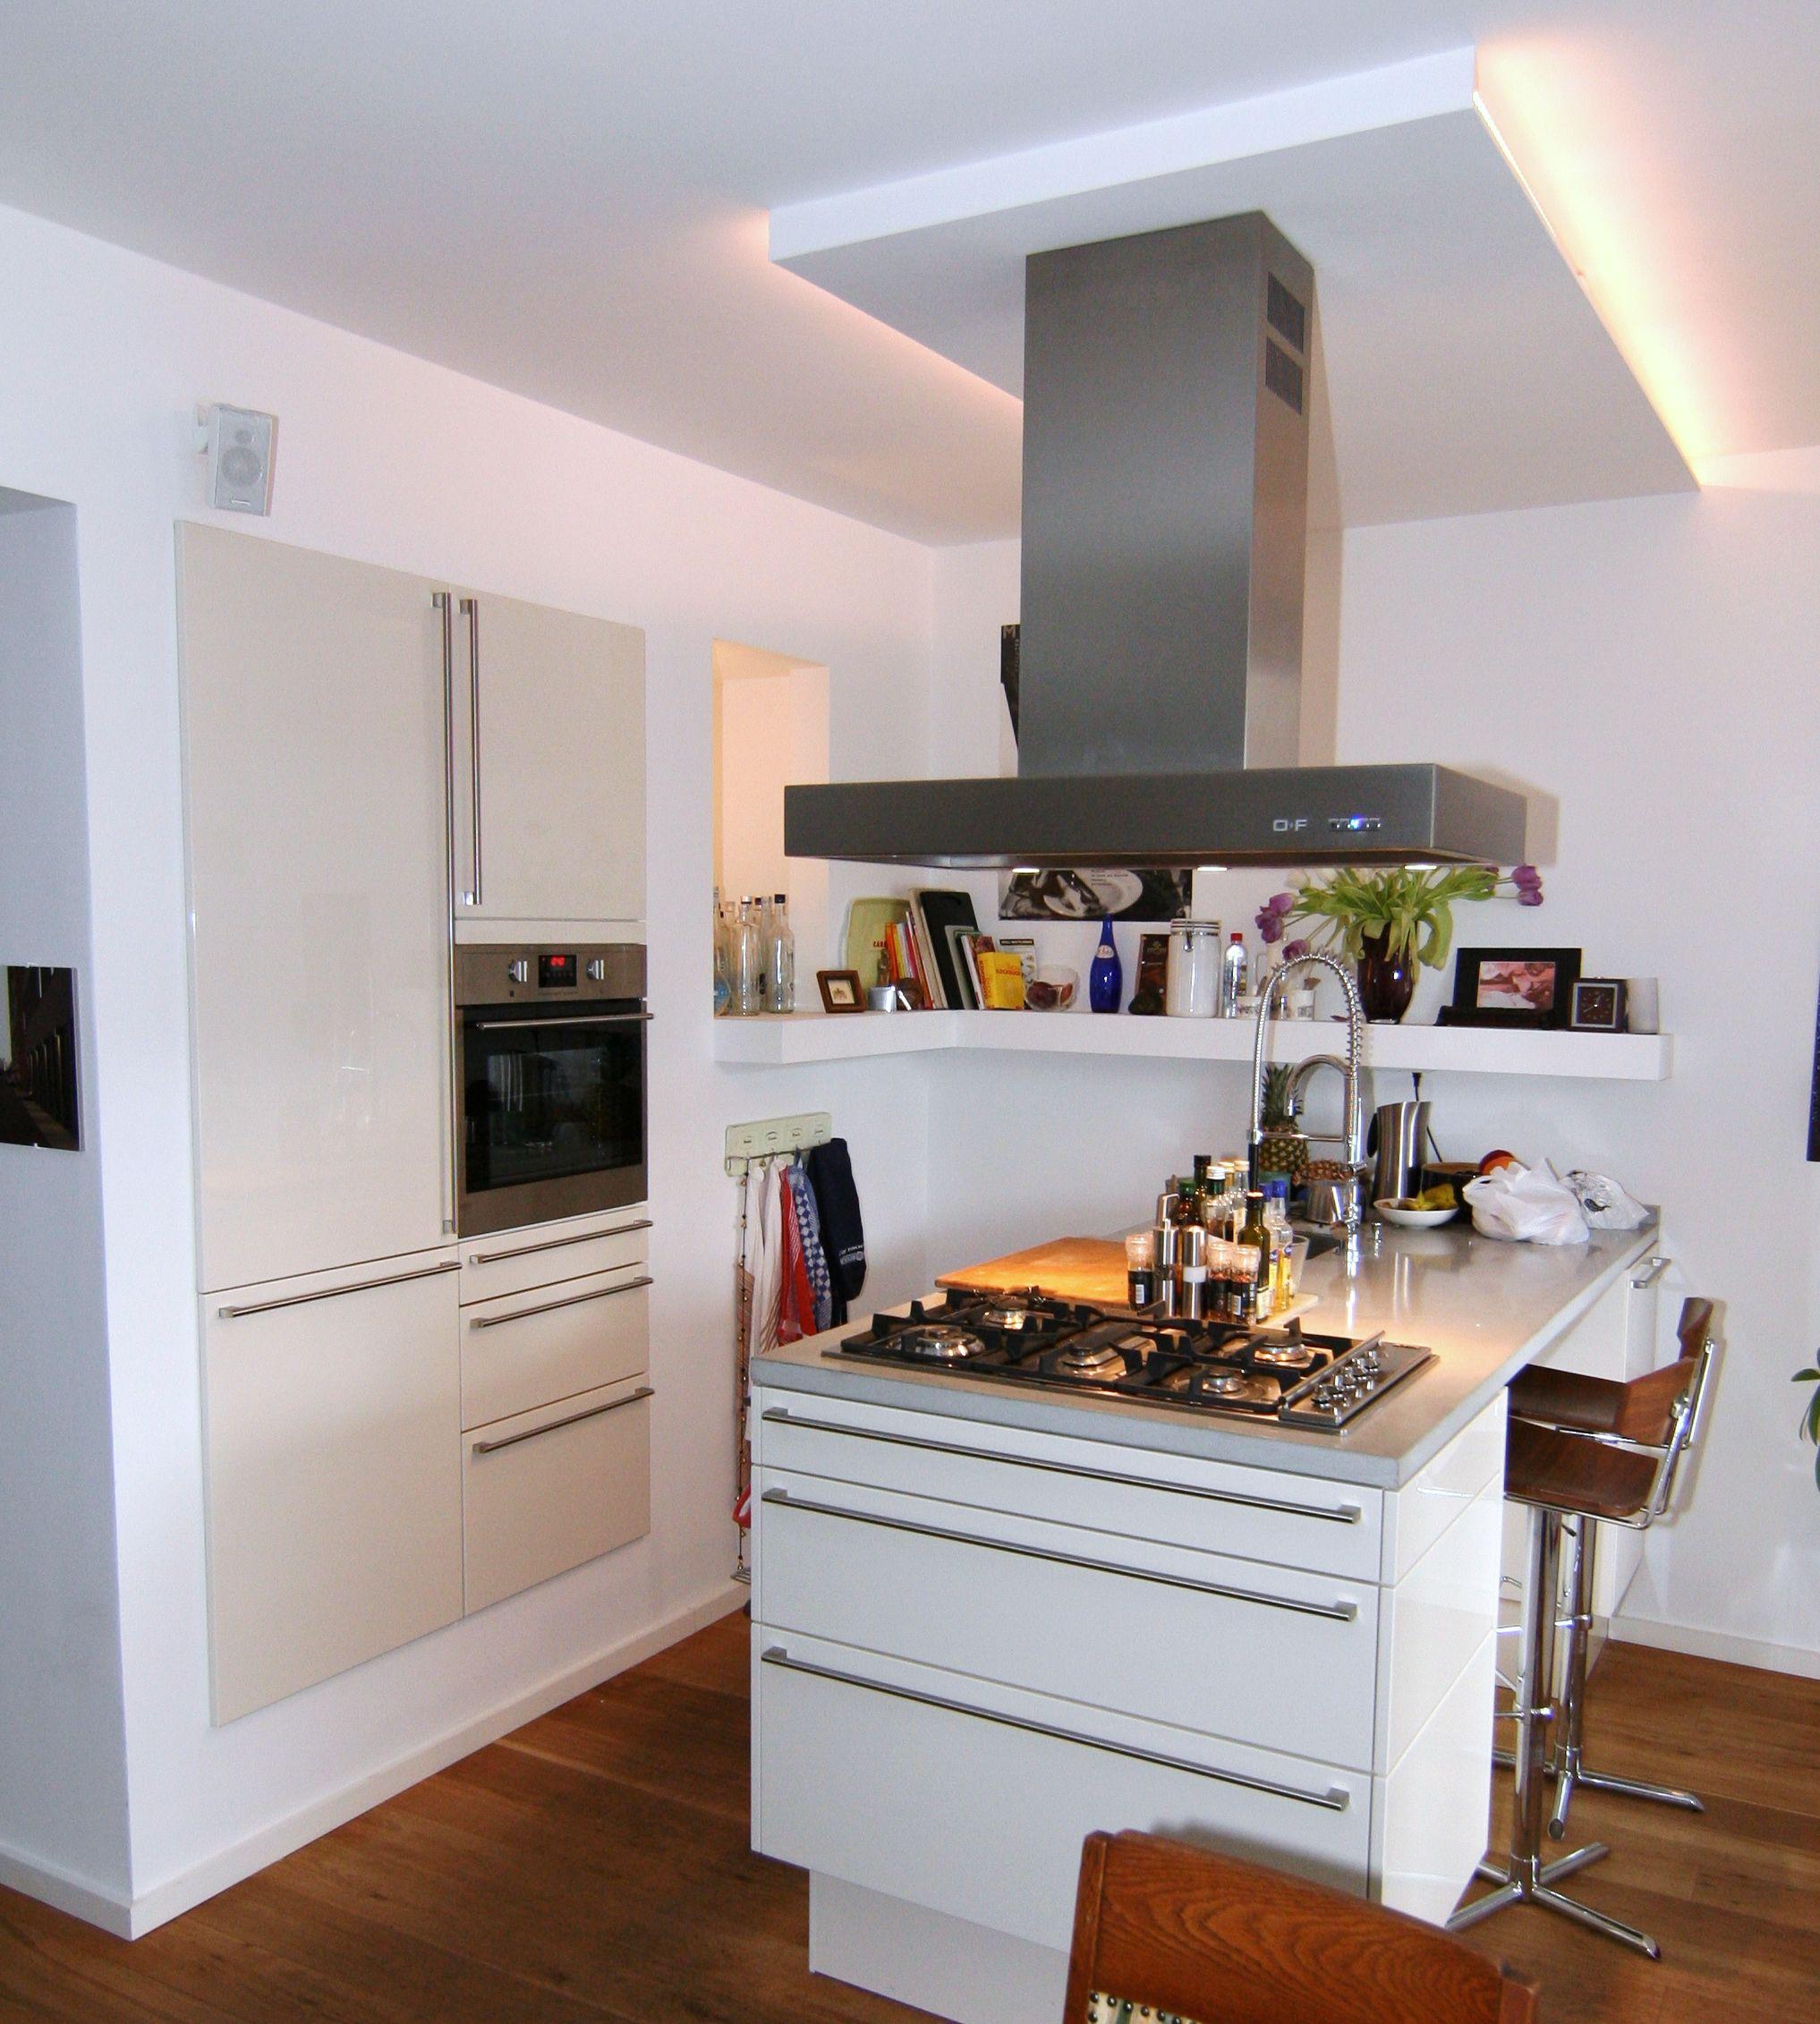 Küche Mit Kochinsel  küche mit kochinsel klein Google Suche